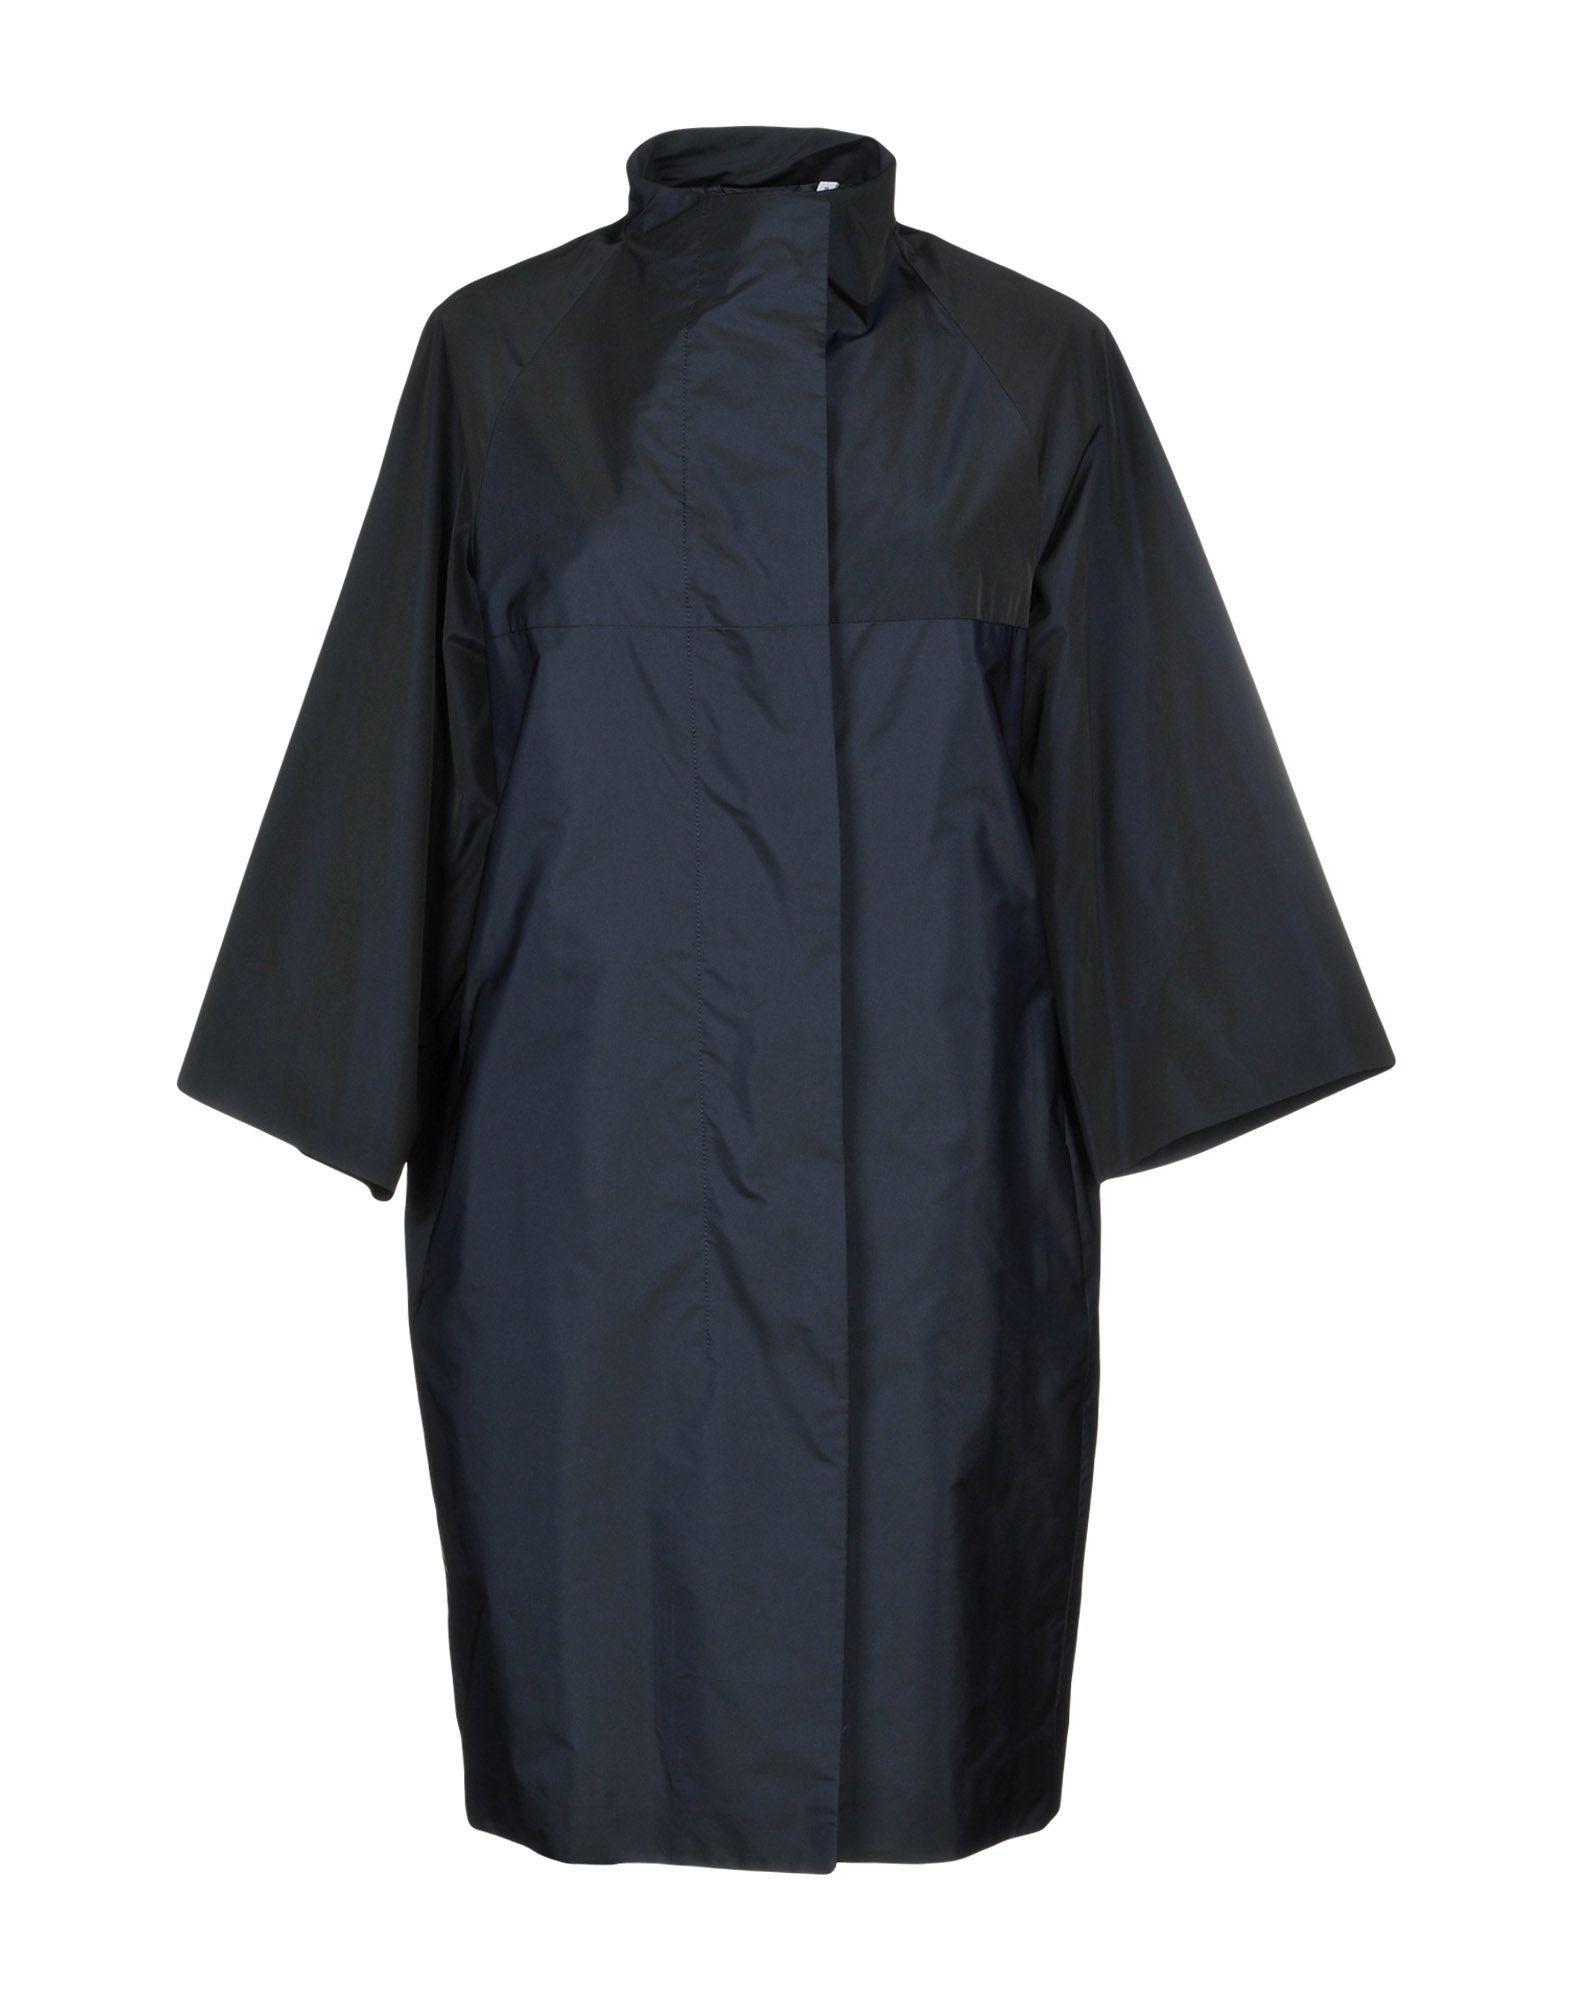 Aspesi Overcoats In Dark Blue